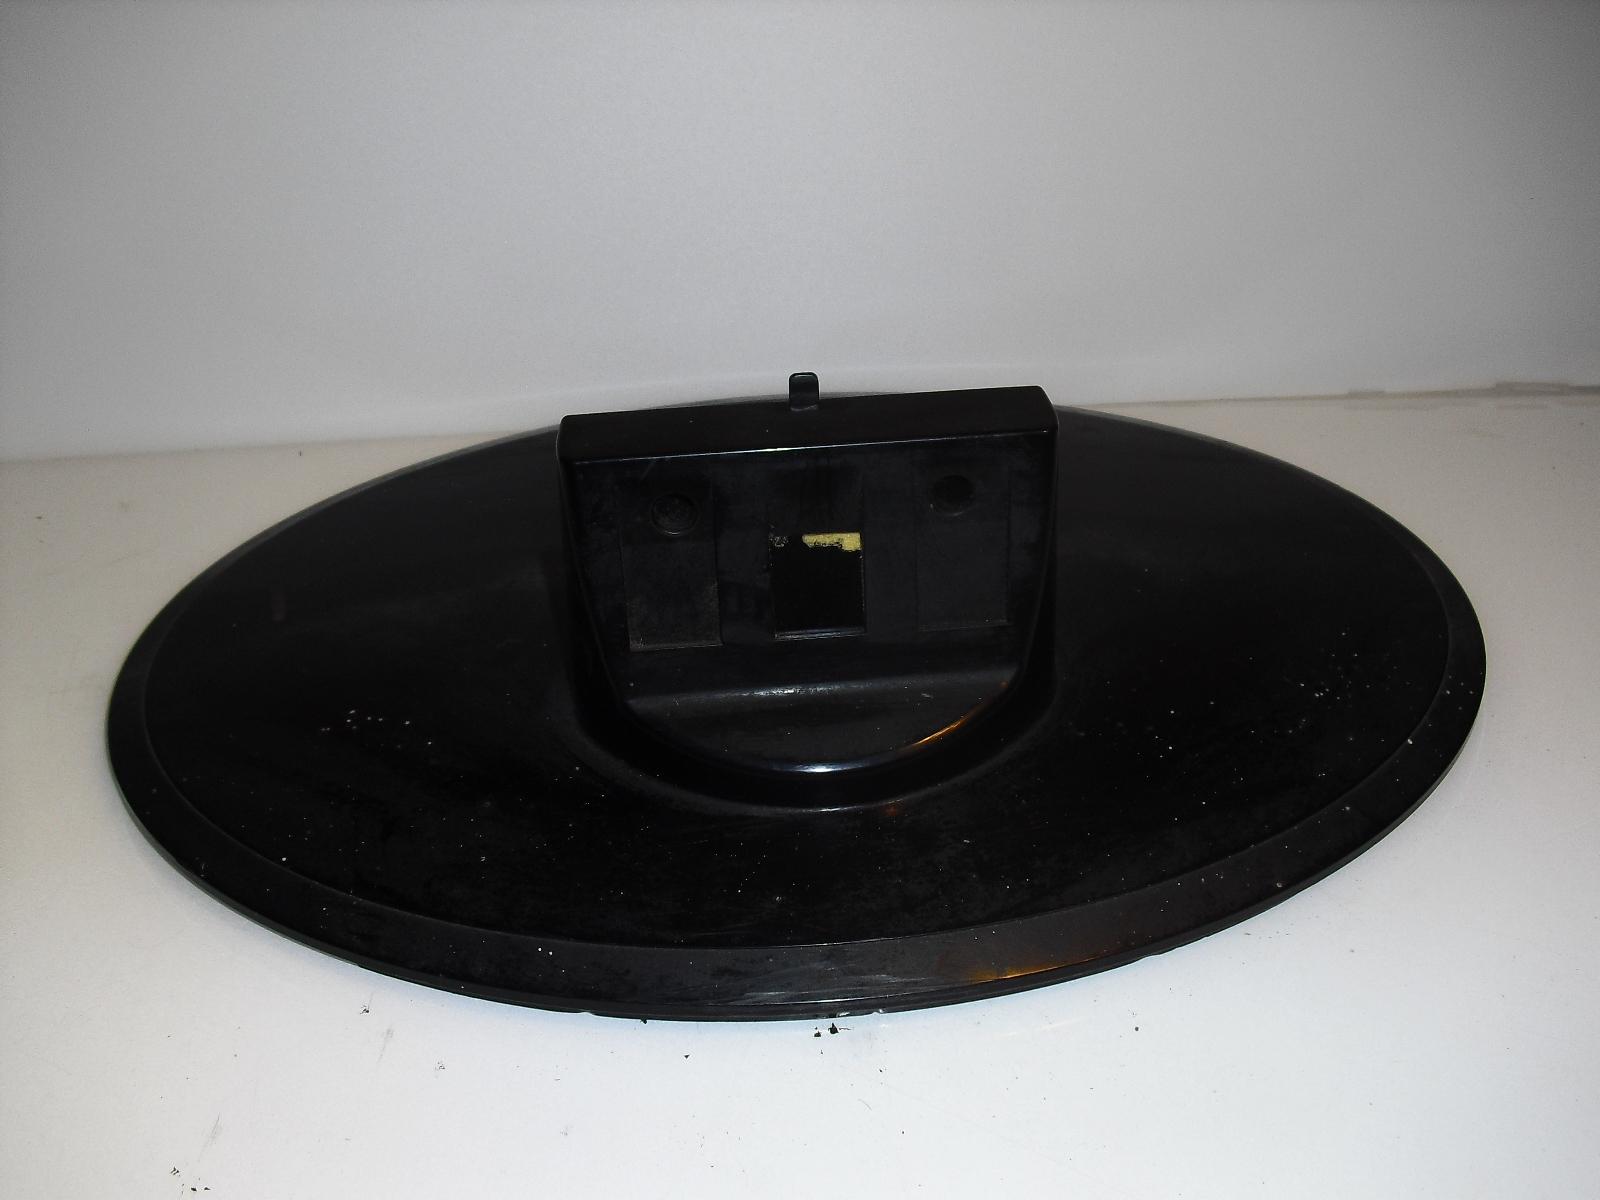 toshiba 26av500 u    stand  base   with  screws - $22.99